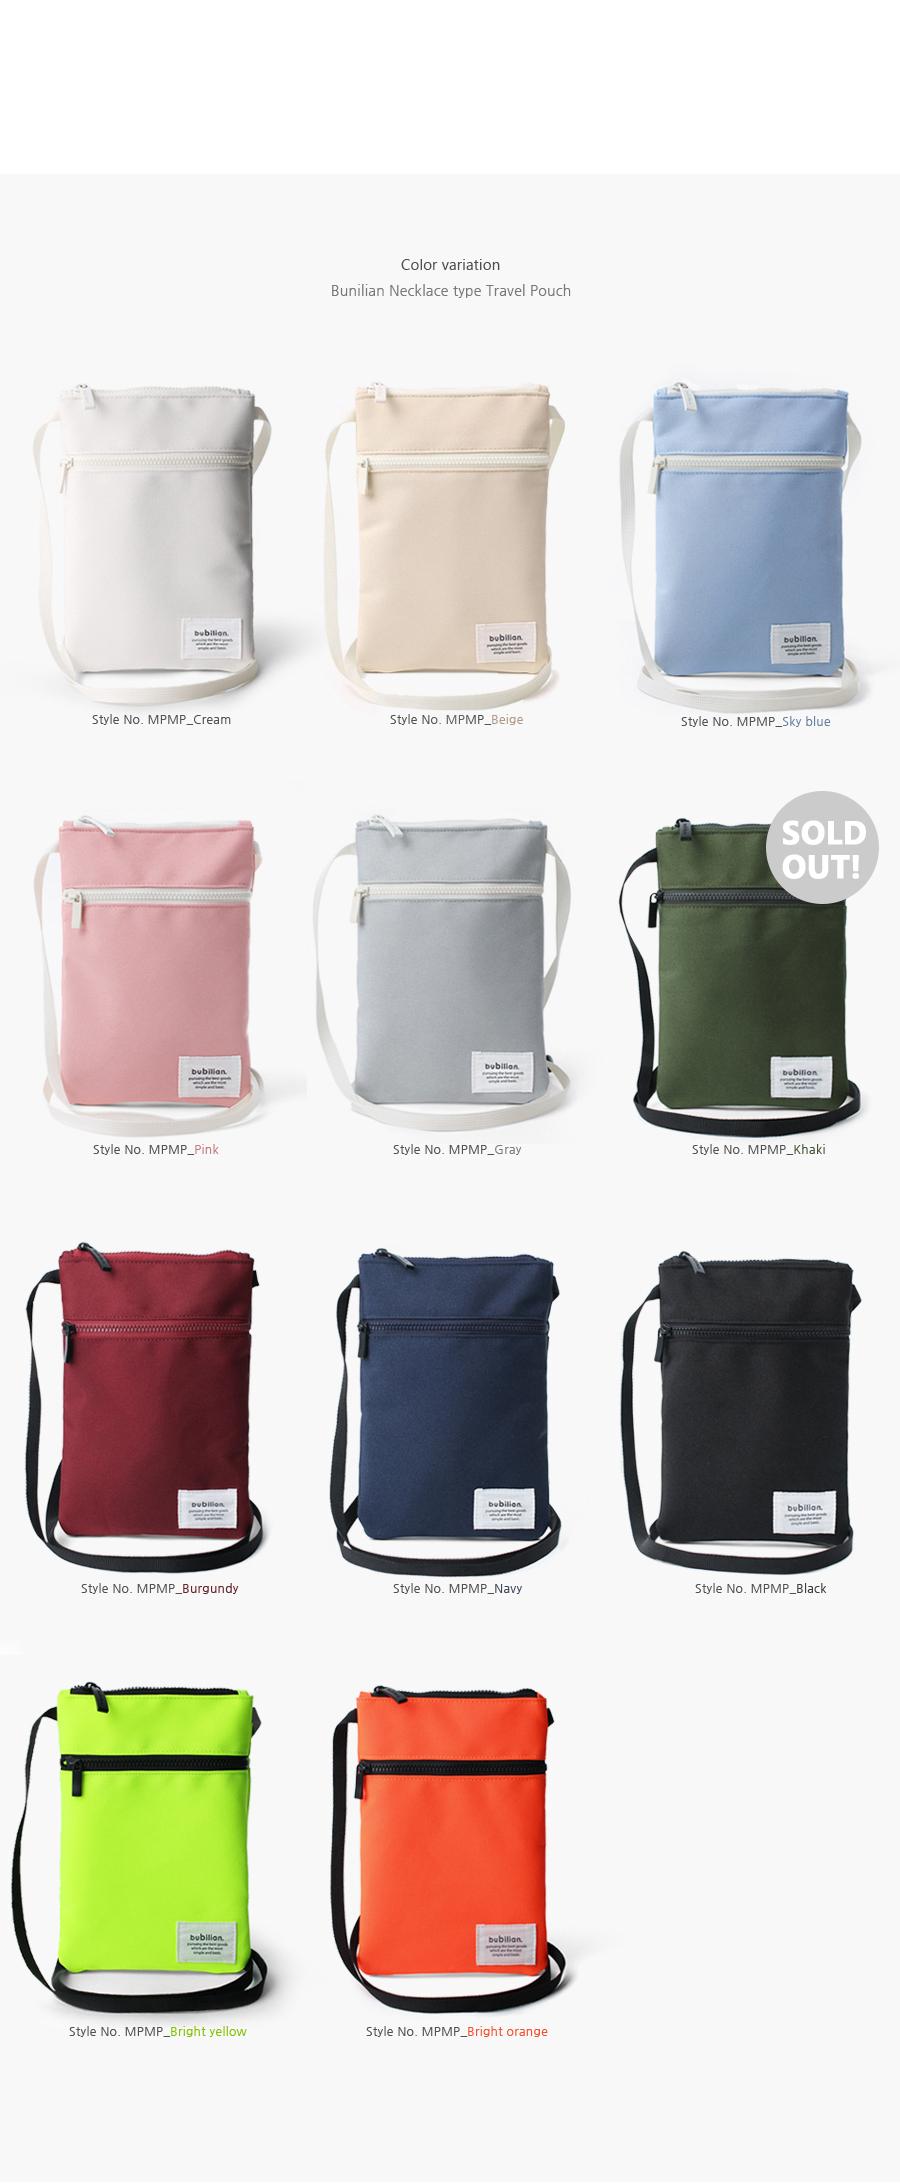 BuBilian basic mini pouch _BLACK - 버빌리안, 8,400원, 크로스백, 패브릭크로스백